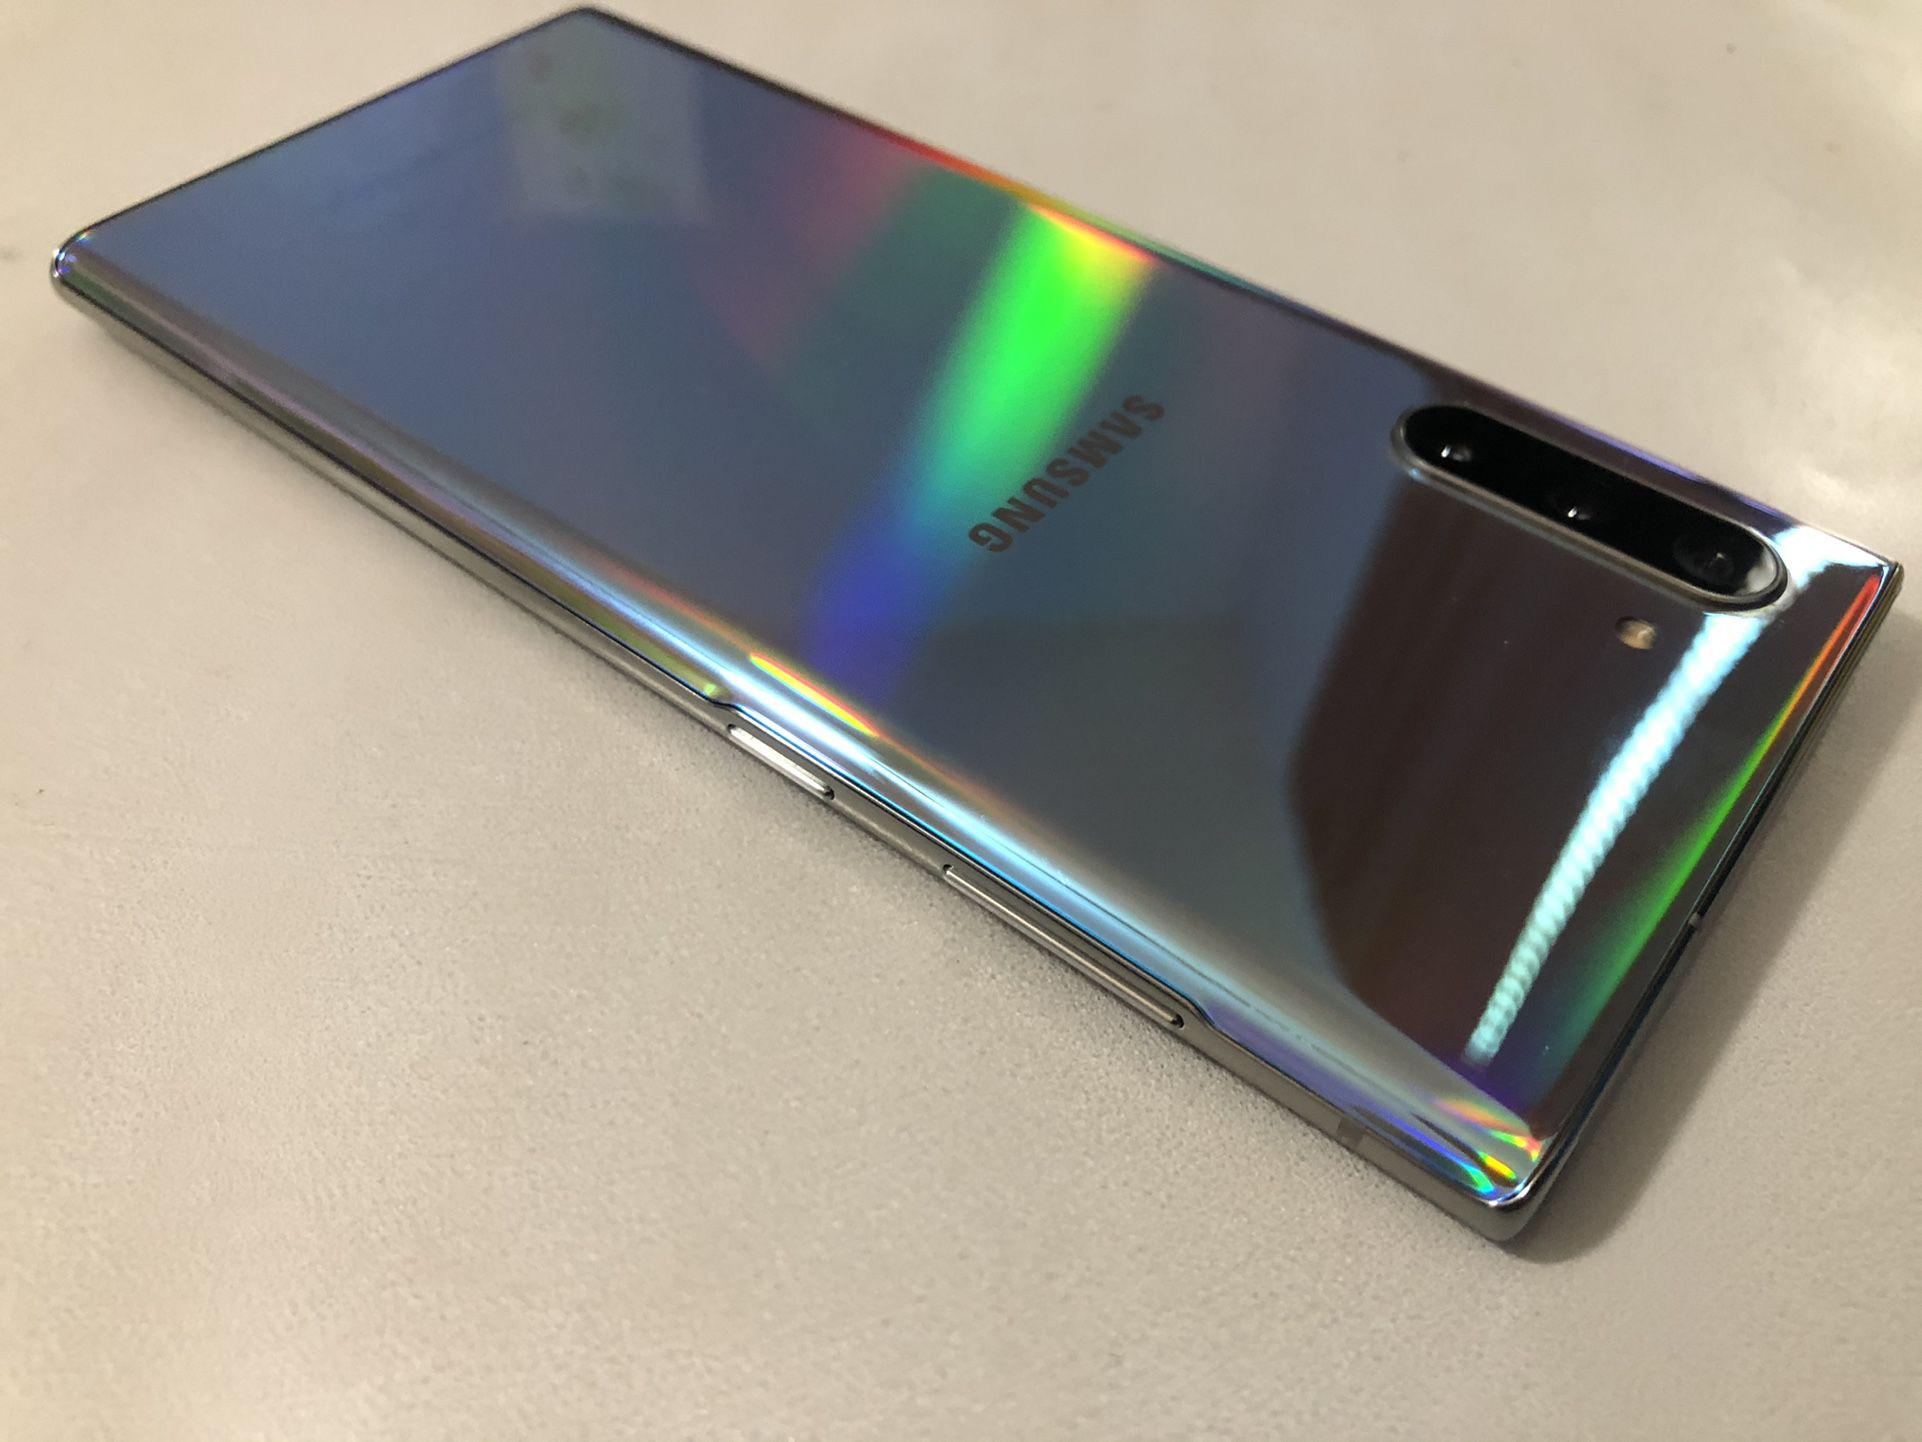 Samsung Galaxy Note 10 Like New Unlocked 256gb Firm Price $390